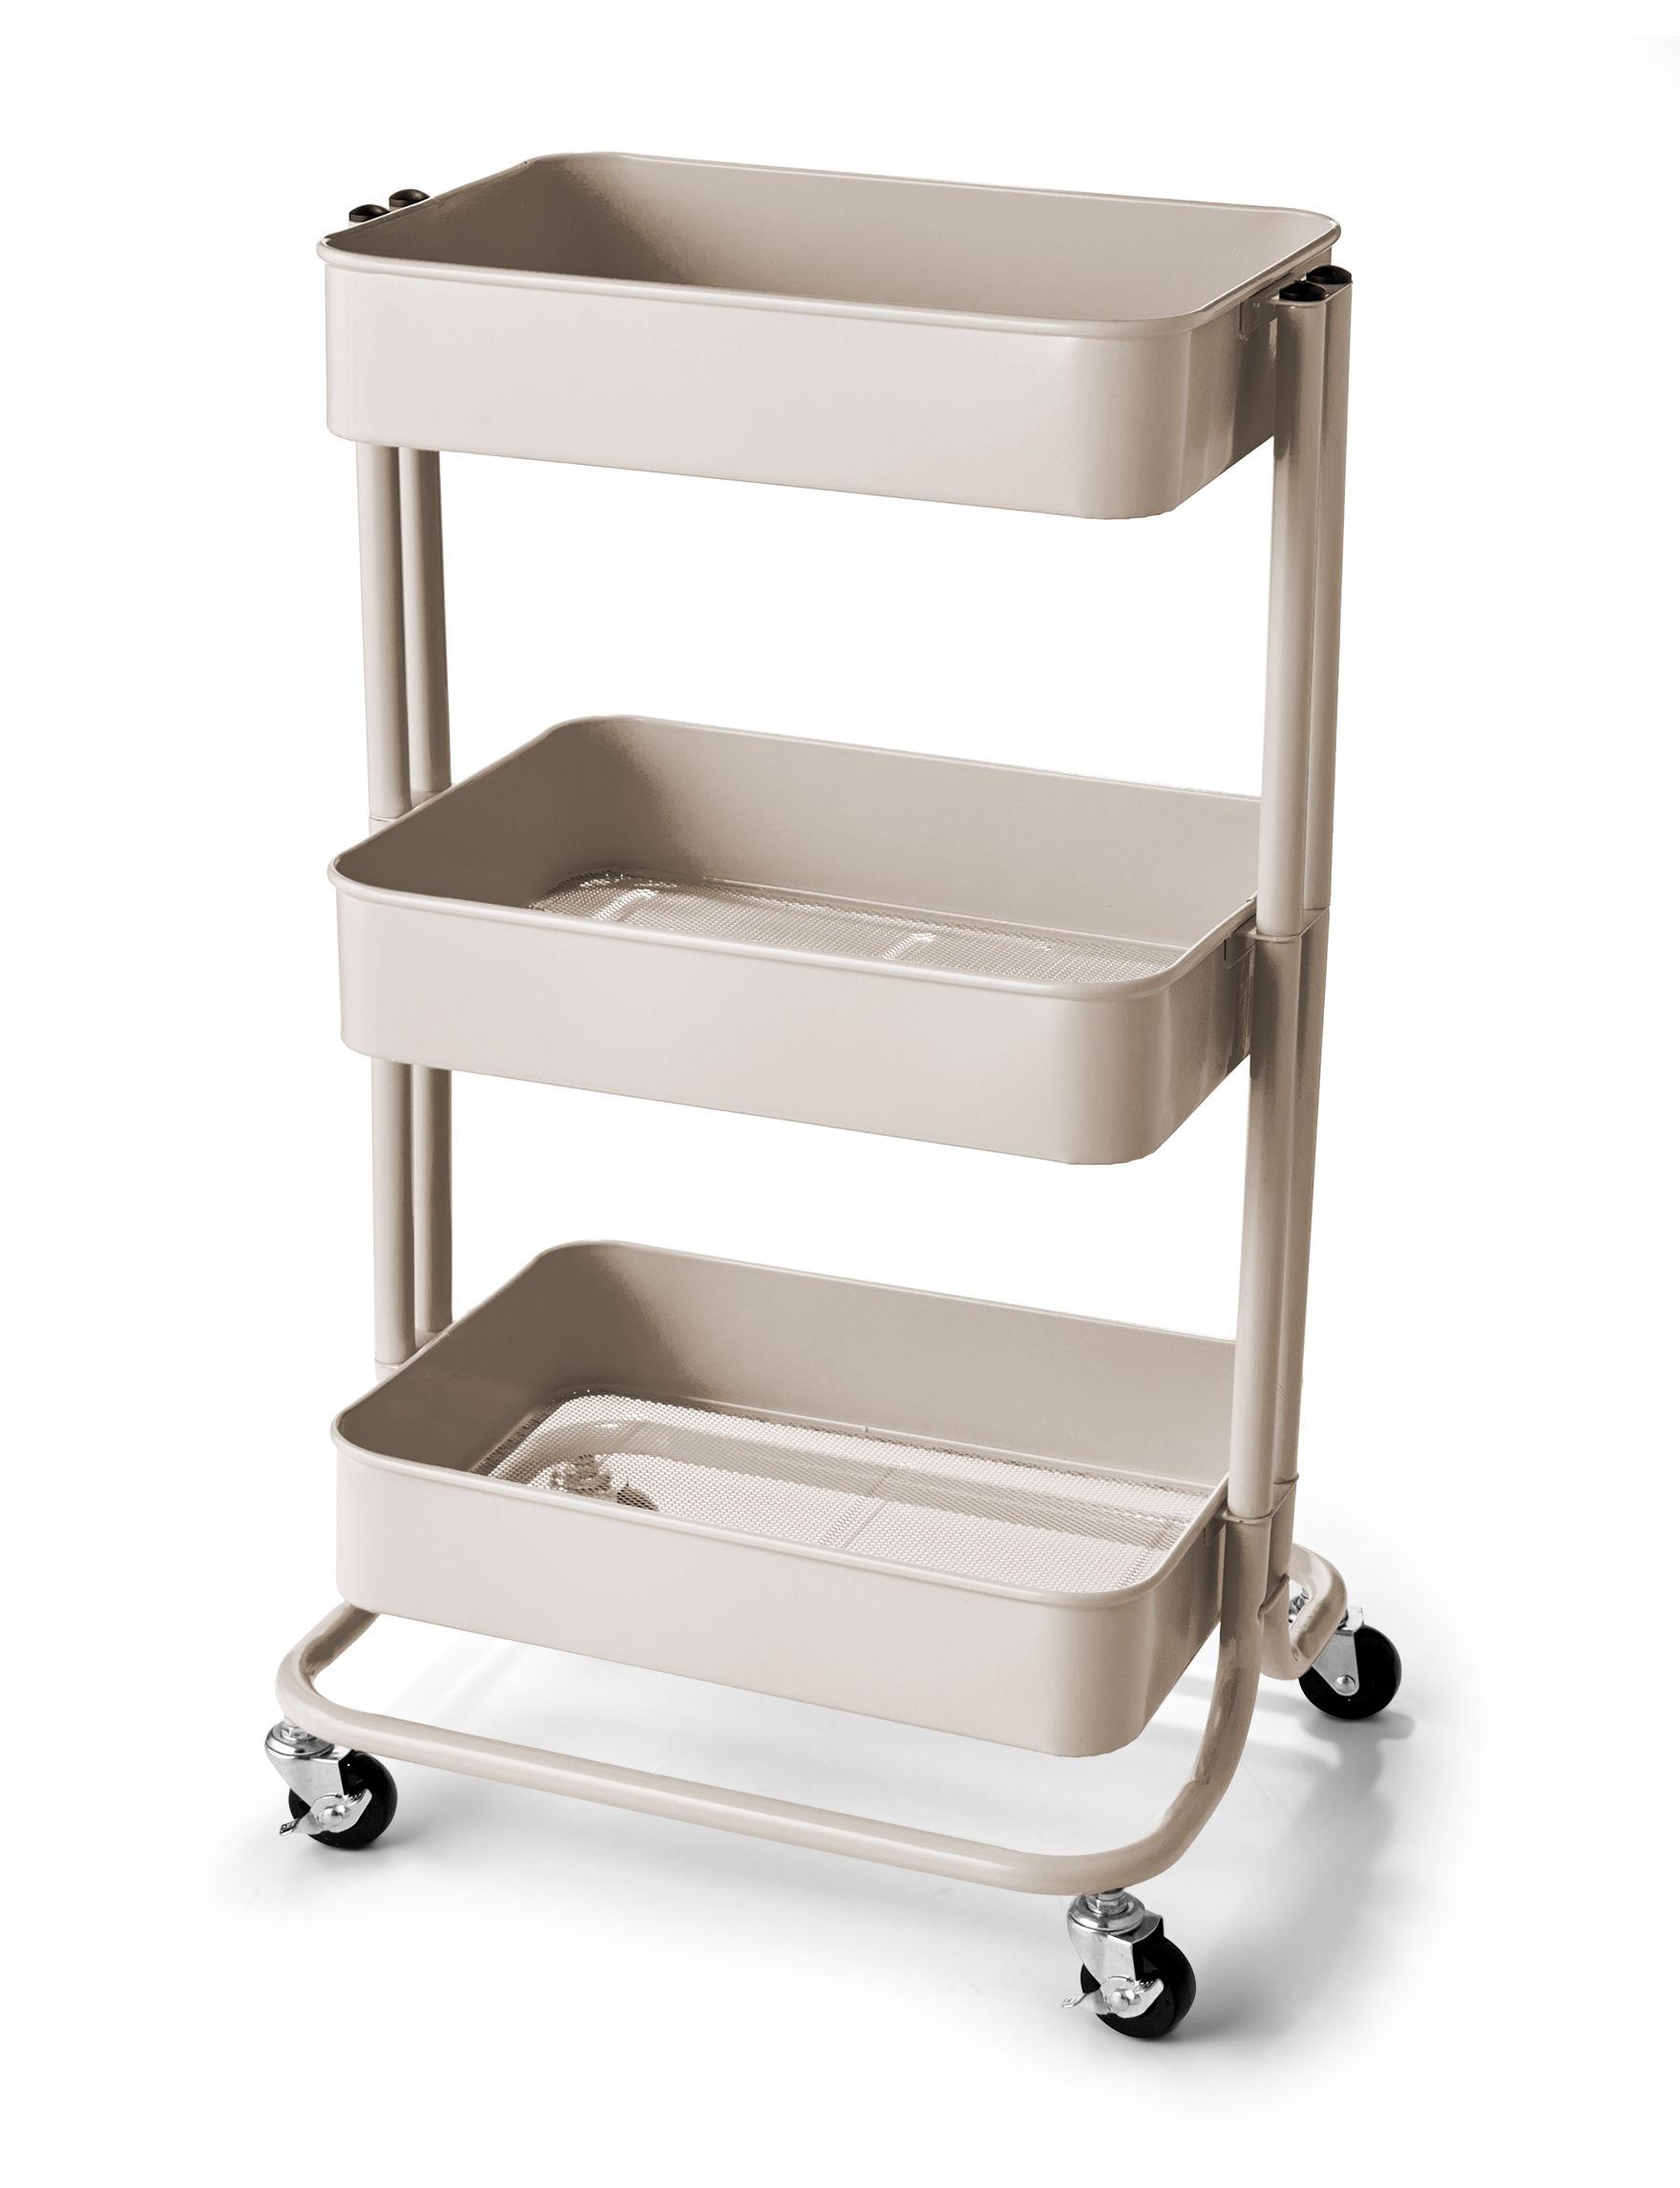 Urban Shop 3 Tier Rolling Storage Cart Stage Stores